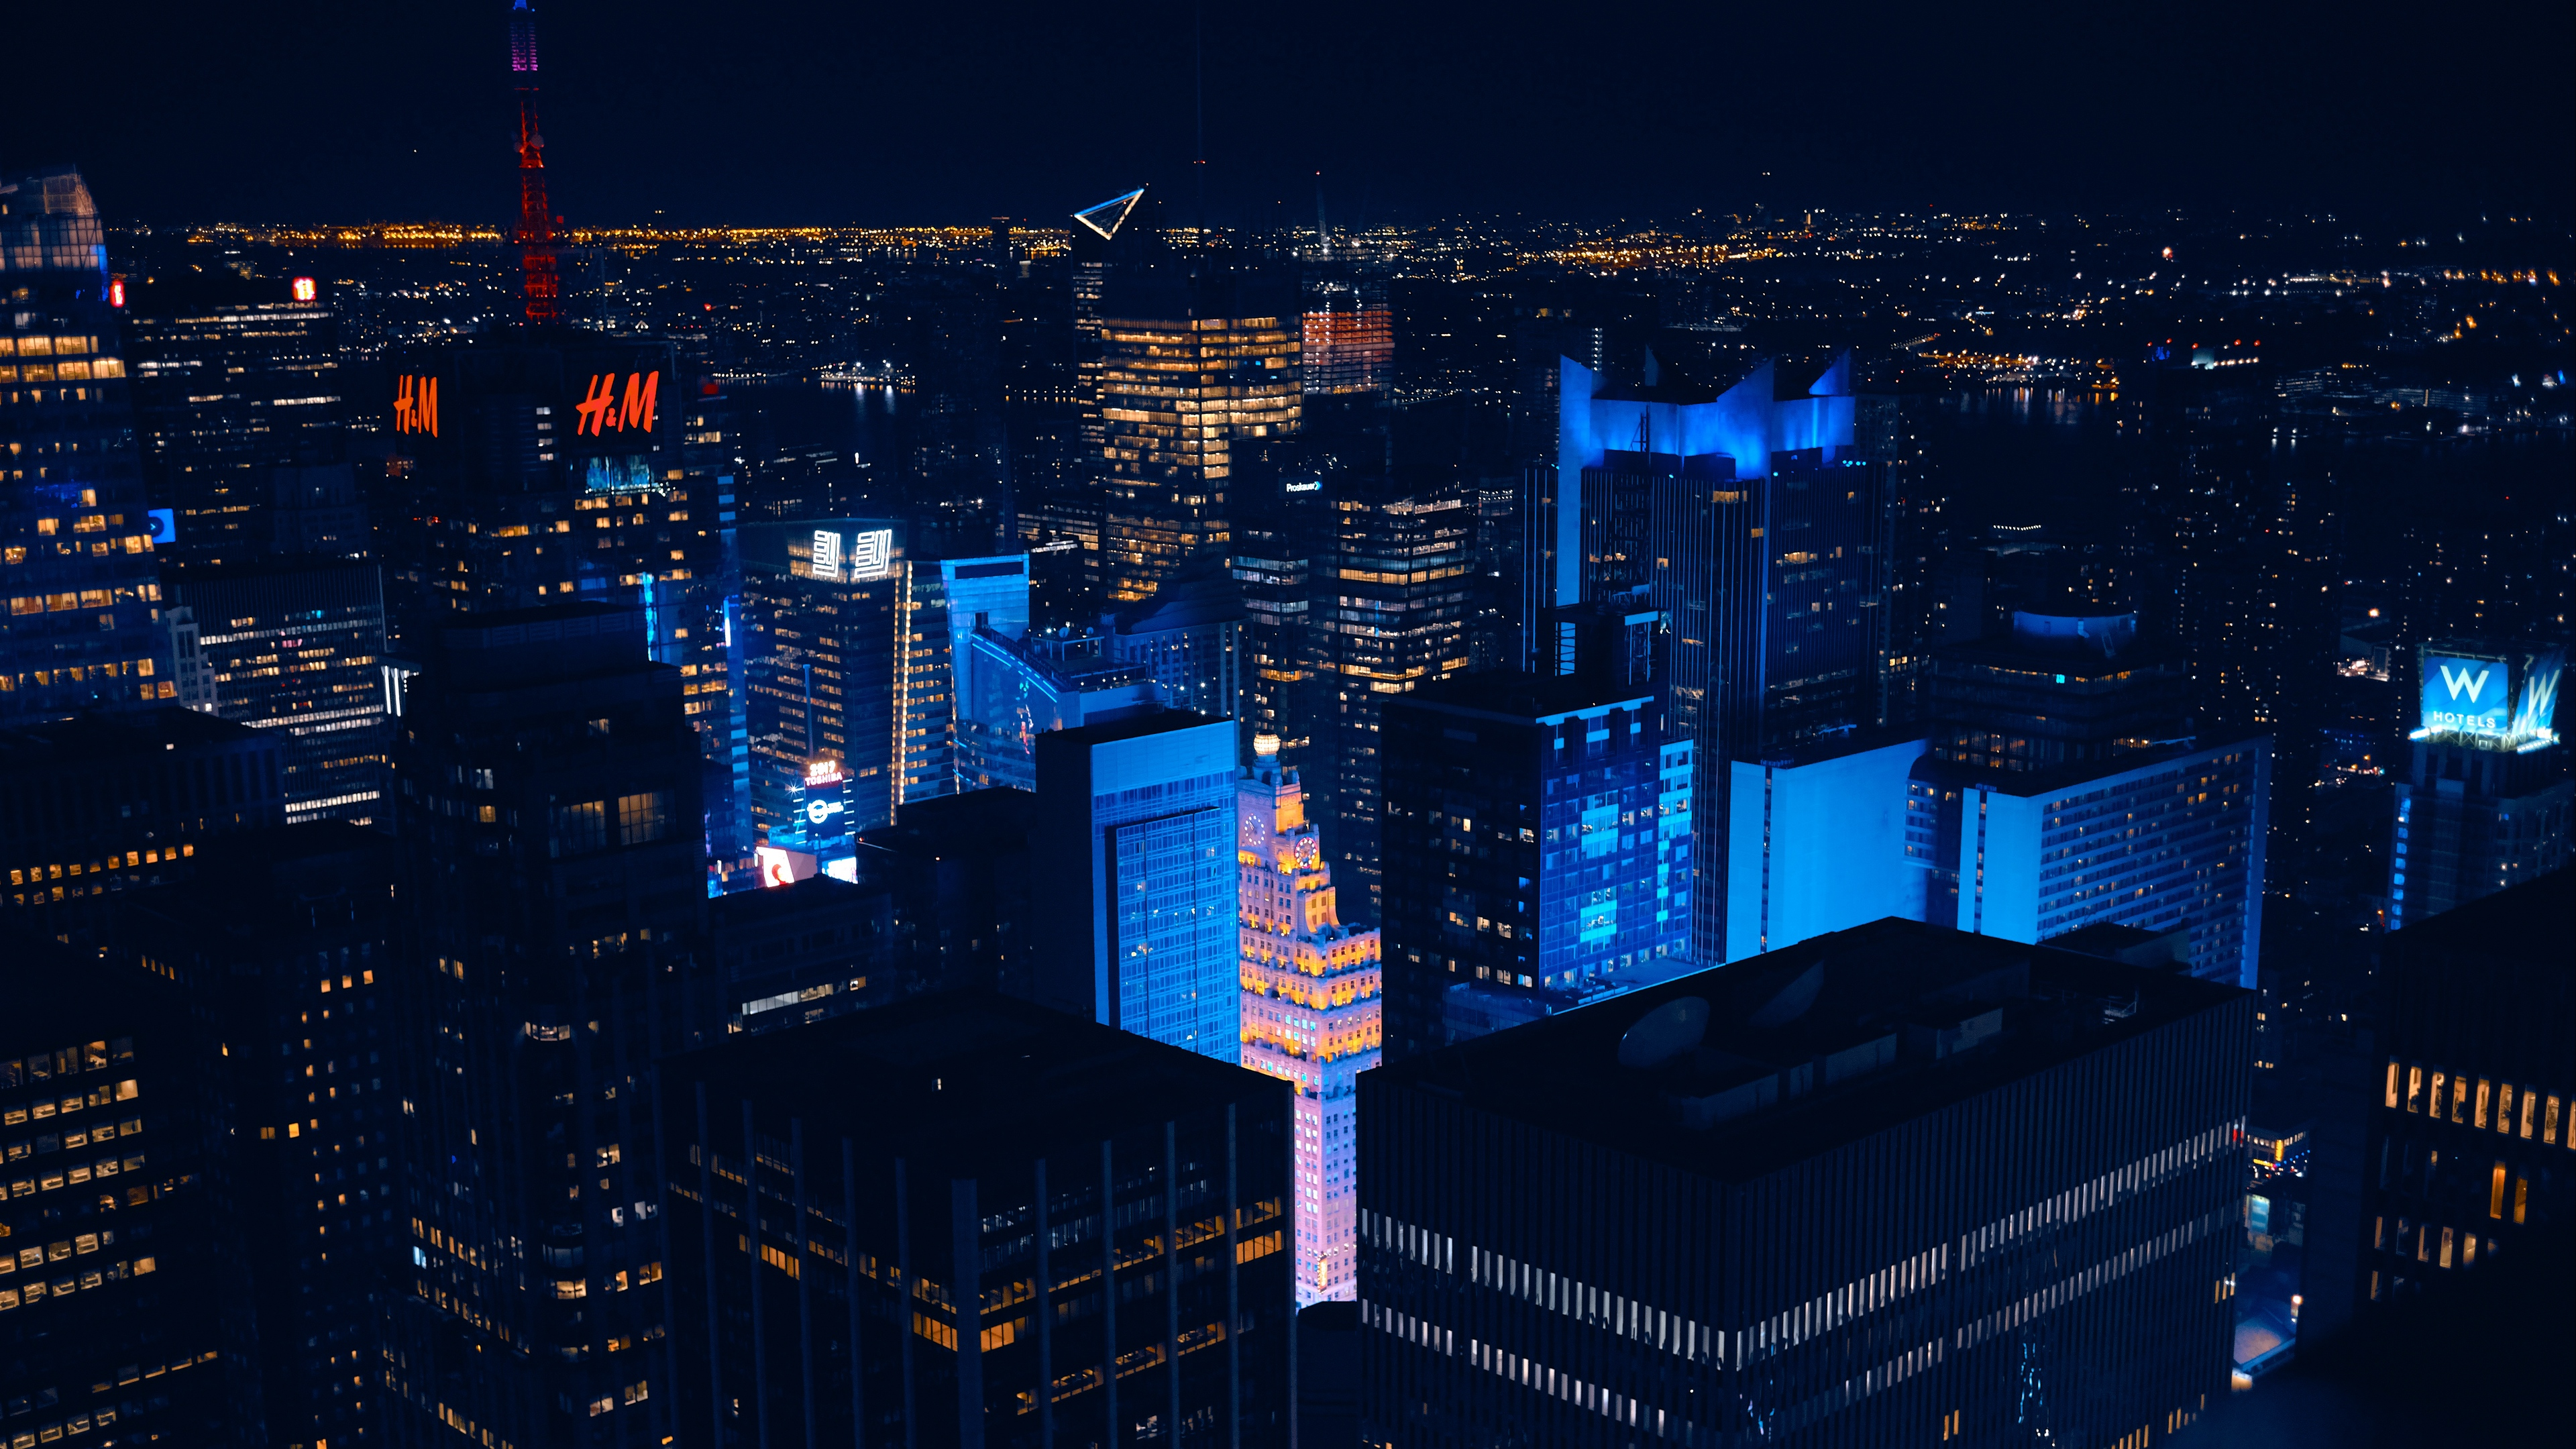 new york usa skyscrapers night 4k 1538065149 - new york, usa, skyscrapers, night 4k - USA, Skyscrapers, new york